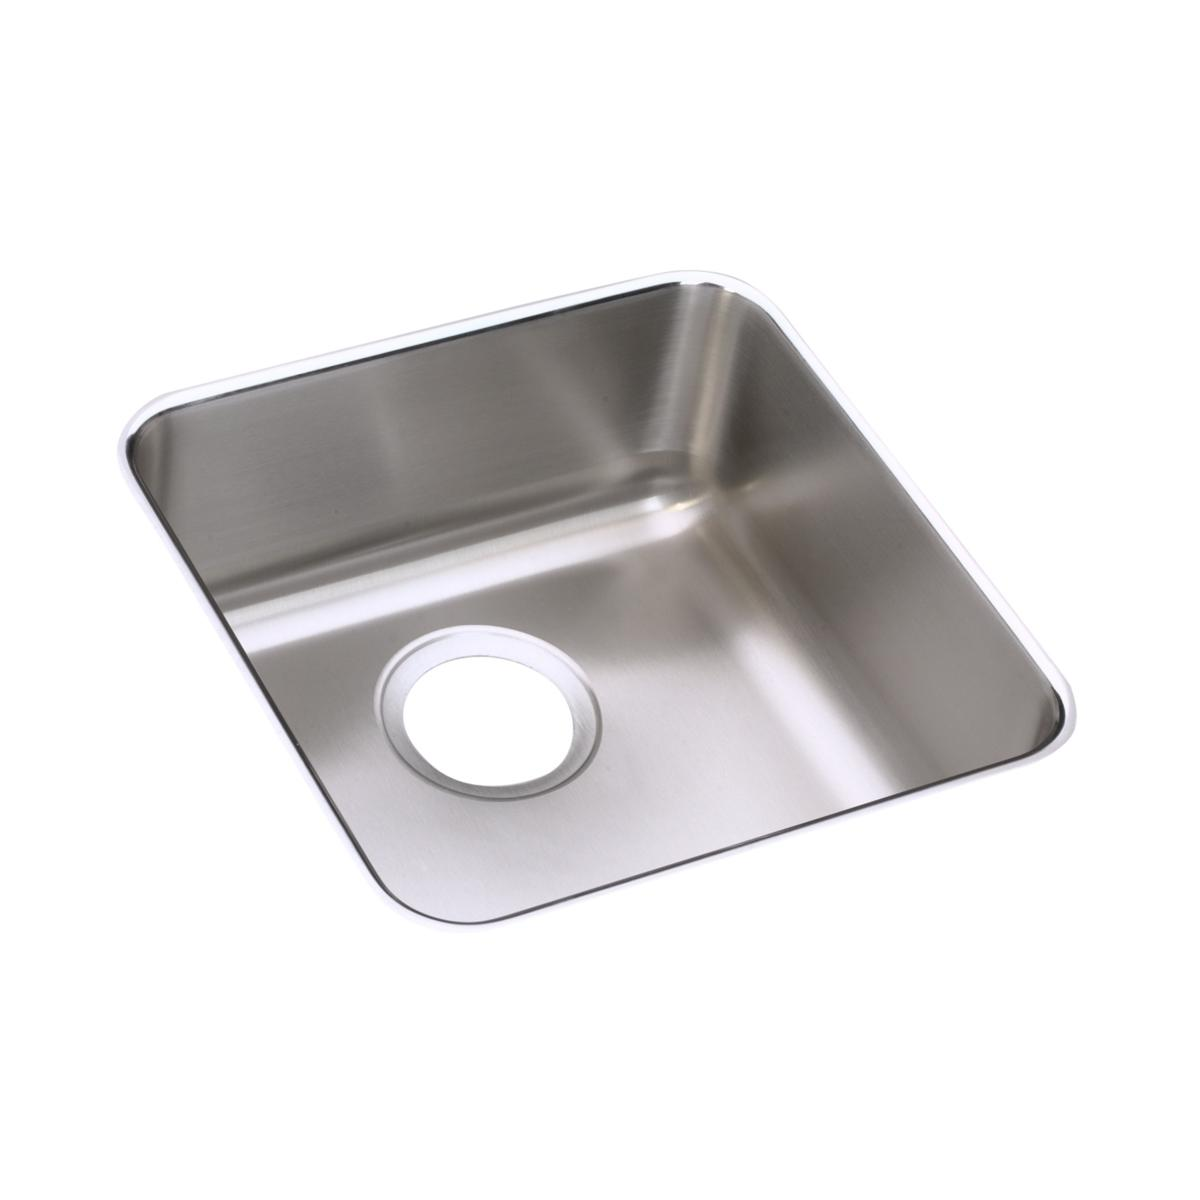 "Elkay Lustertone Classic Stainless Steel 14-1/2"" X 14-1/2"" X 5-3/8"", Single Bowl Undermount ADA Sink"